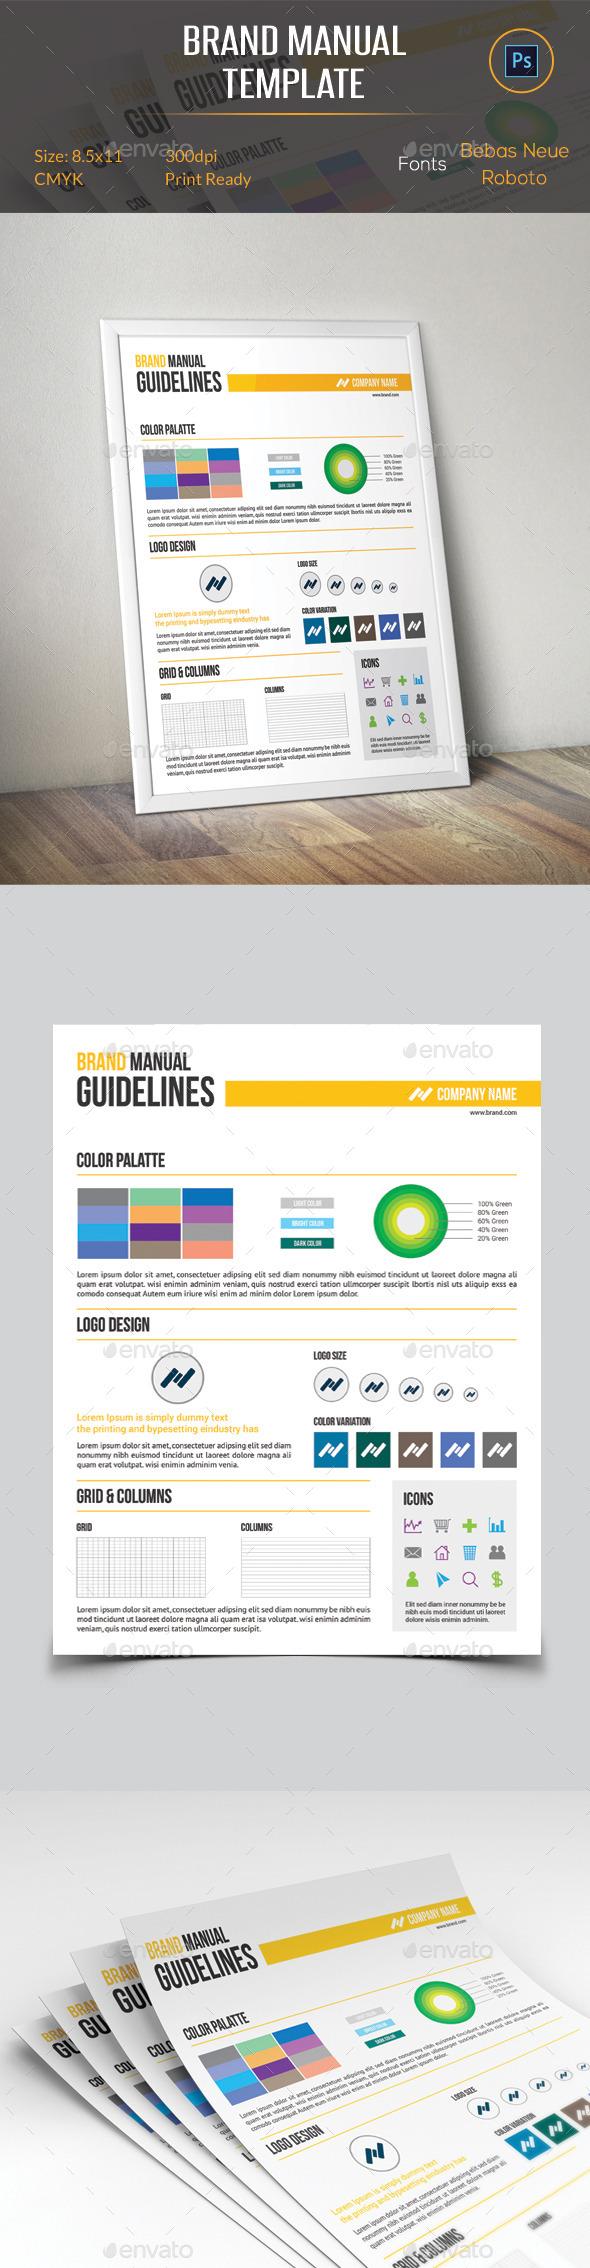 GraphicRiver Brand Manual Template 11373819